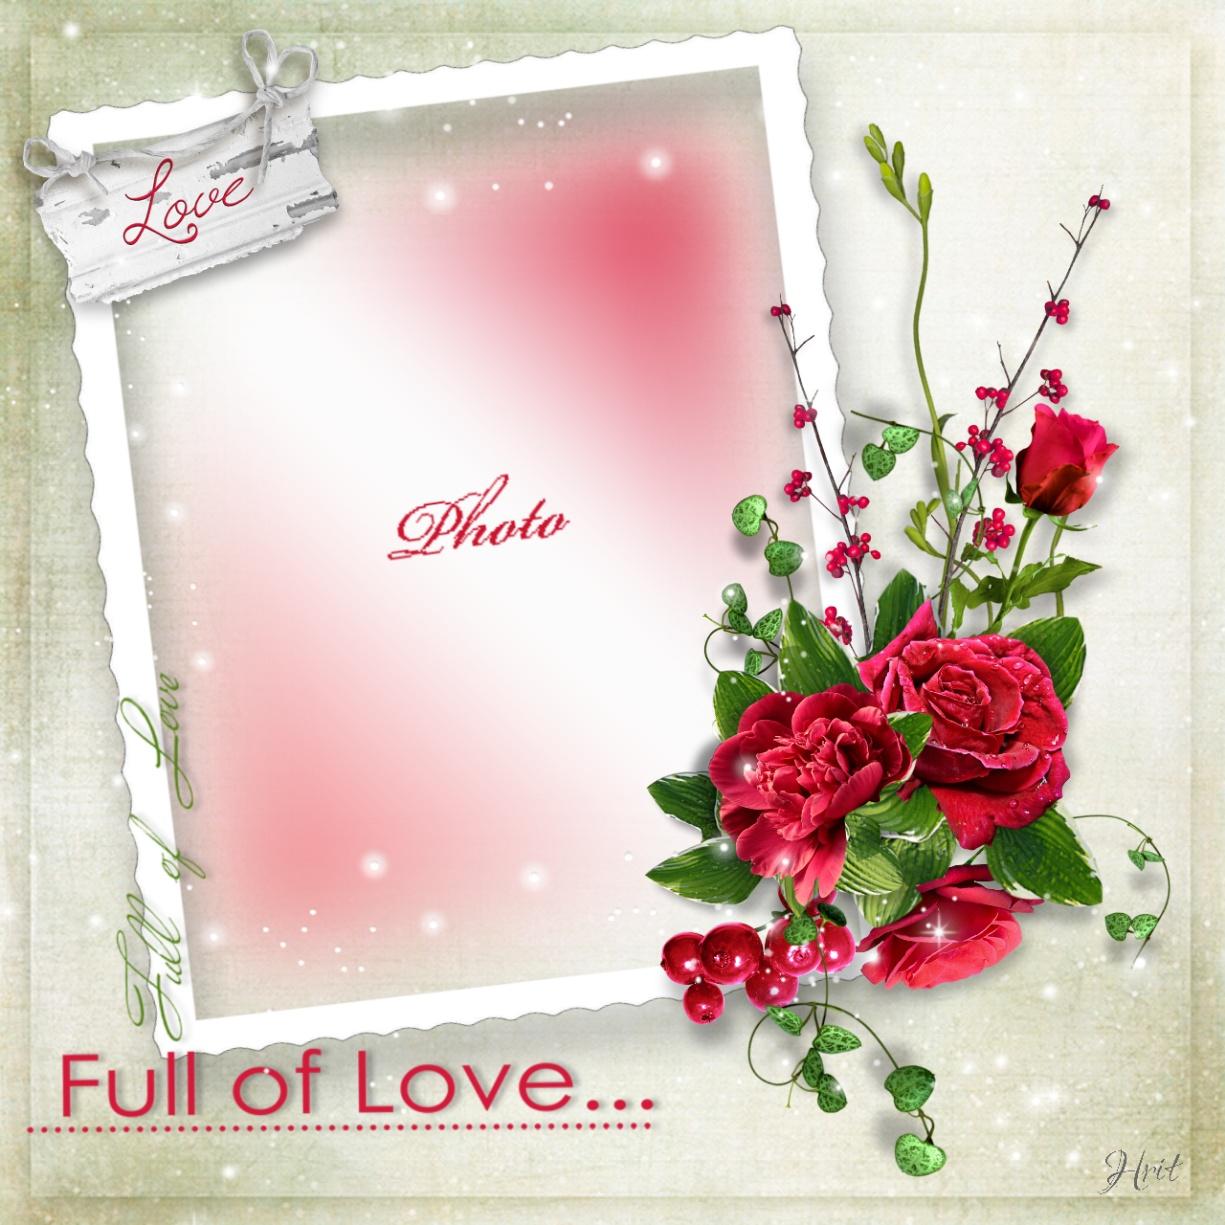 Imikimi Photo Frame Birthday Pixiz Love.Imikimi Com Love Photo Frame Lajulak Org